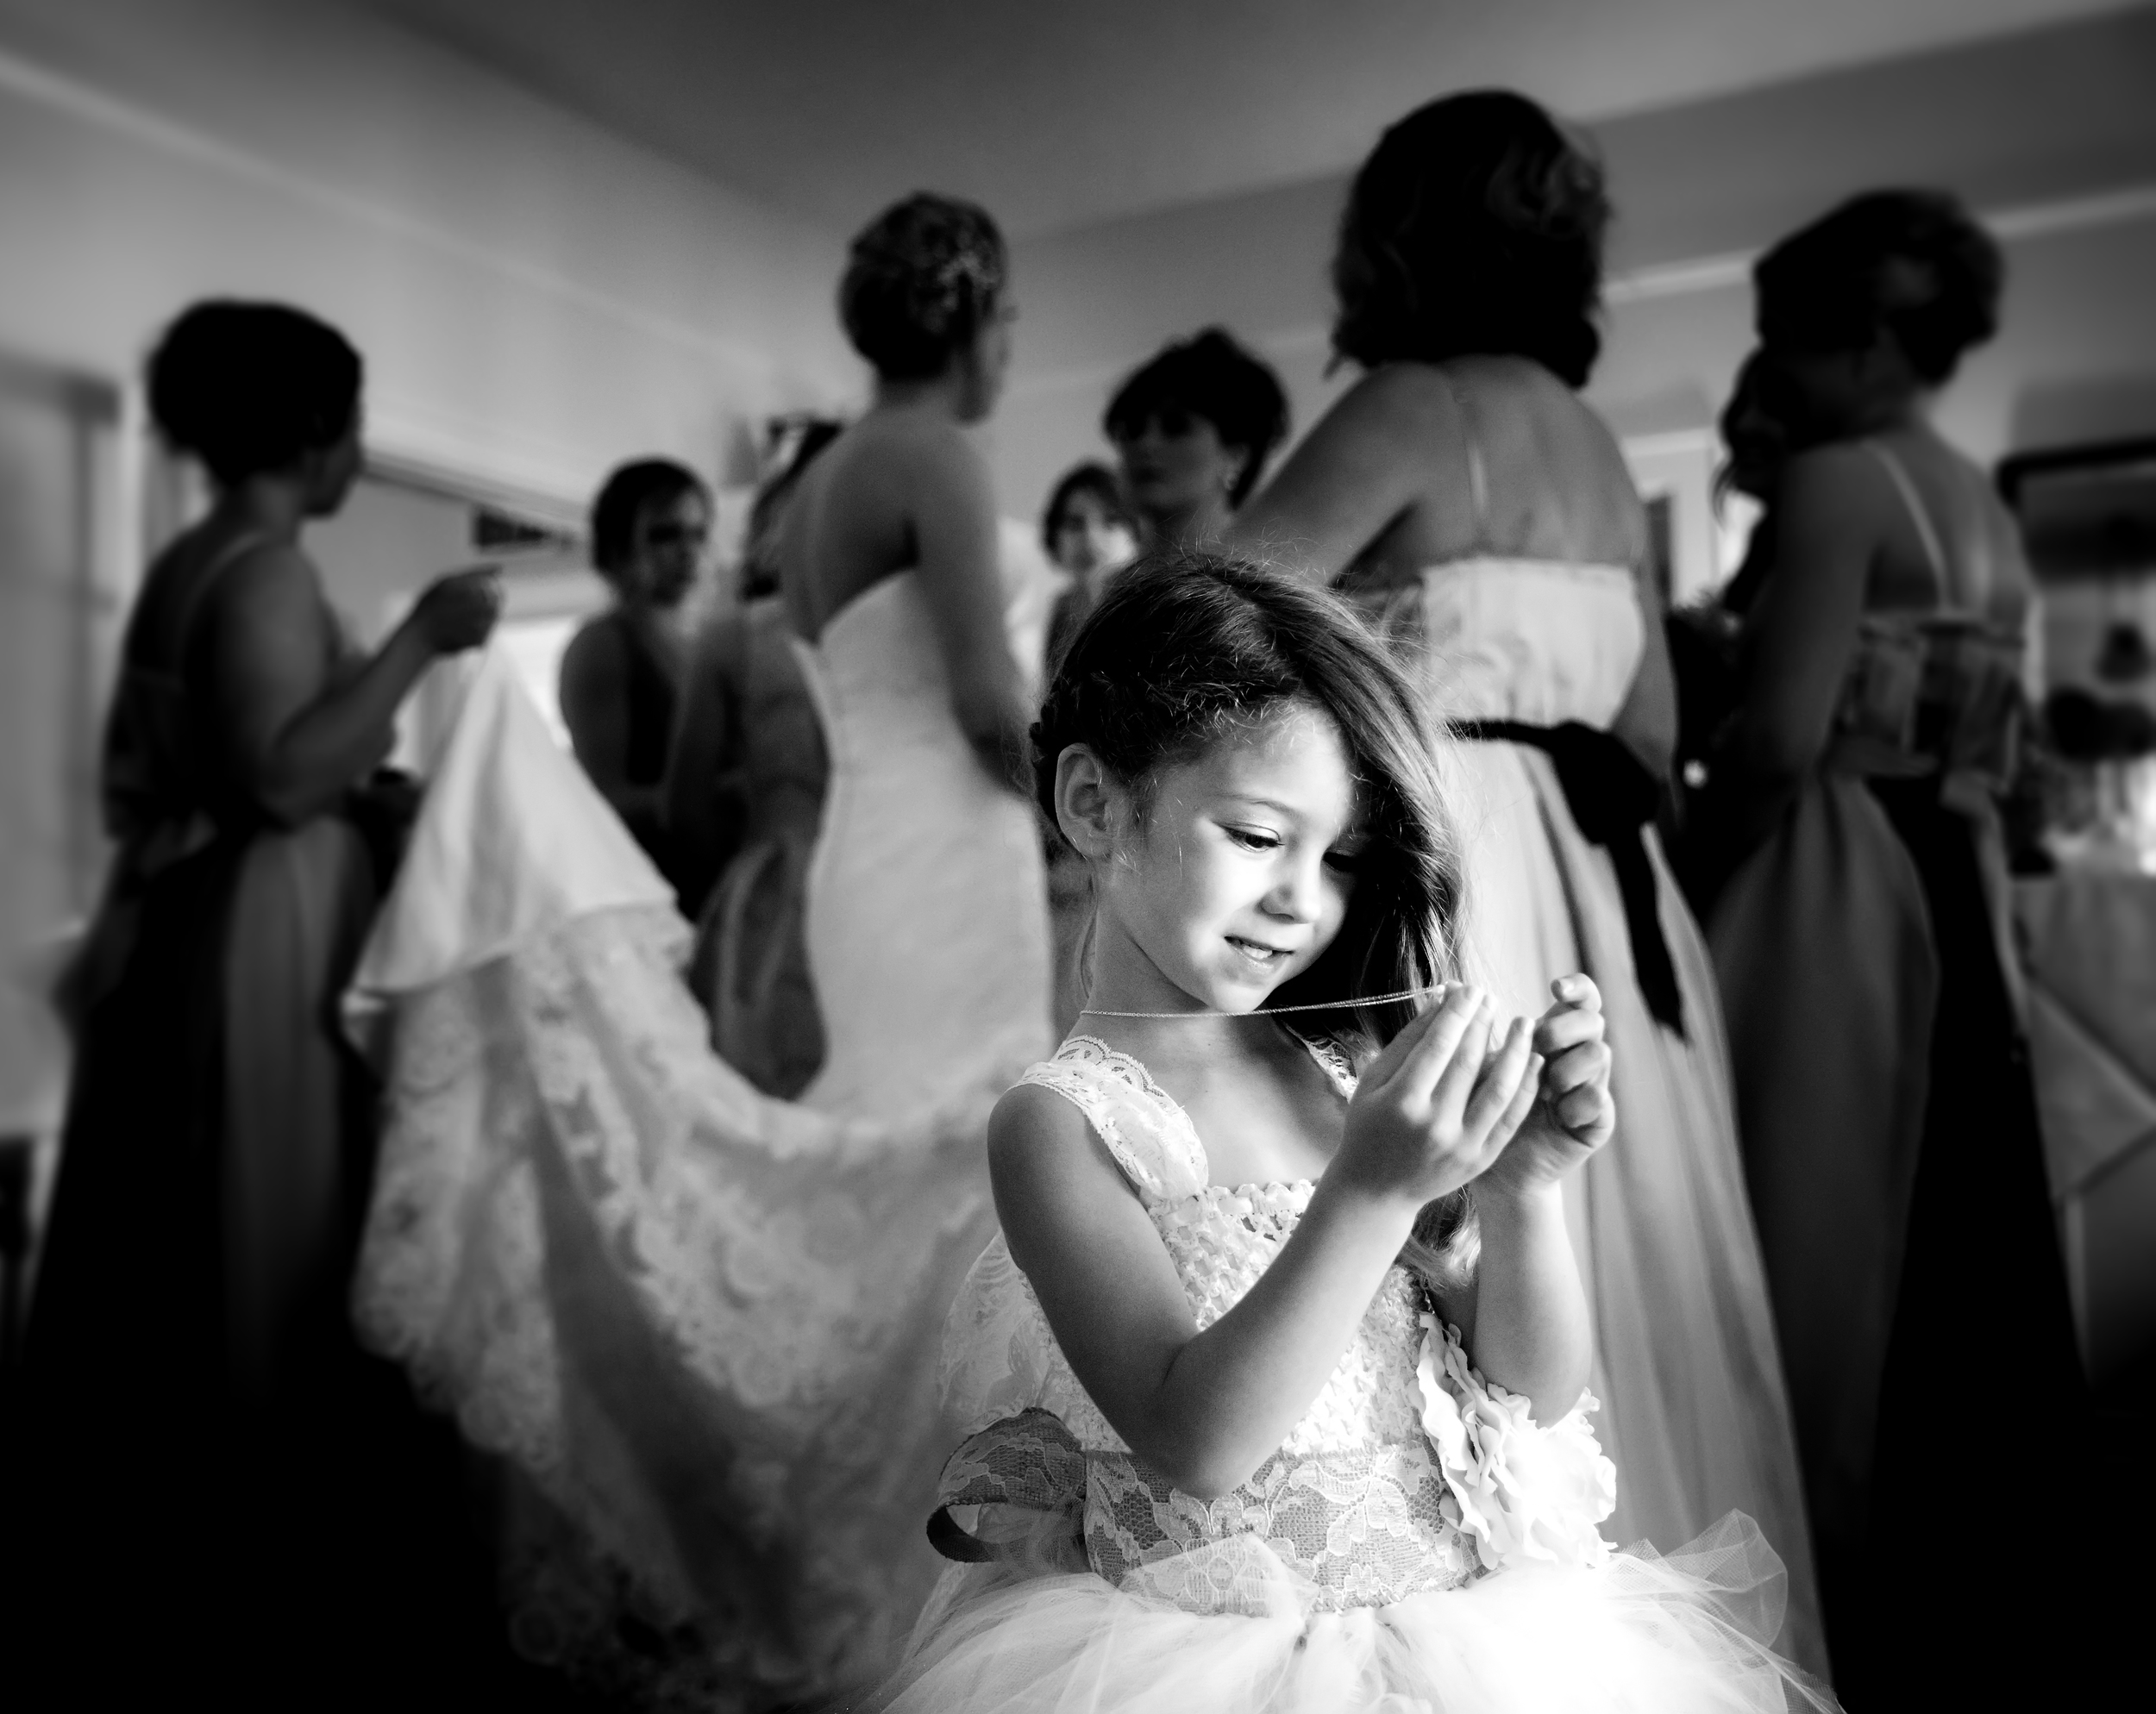 Flower girl smiling at locket before wedding | Rayan Anastor Photography | Traverse City Wedding Photographer.jpg